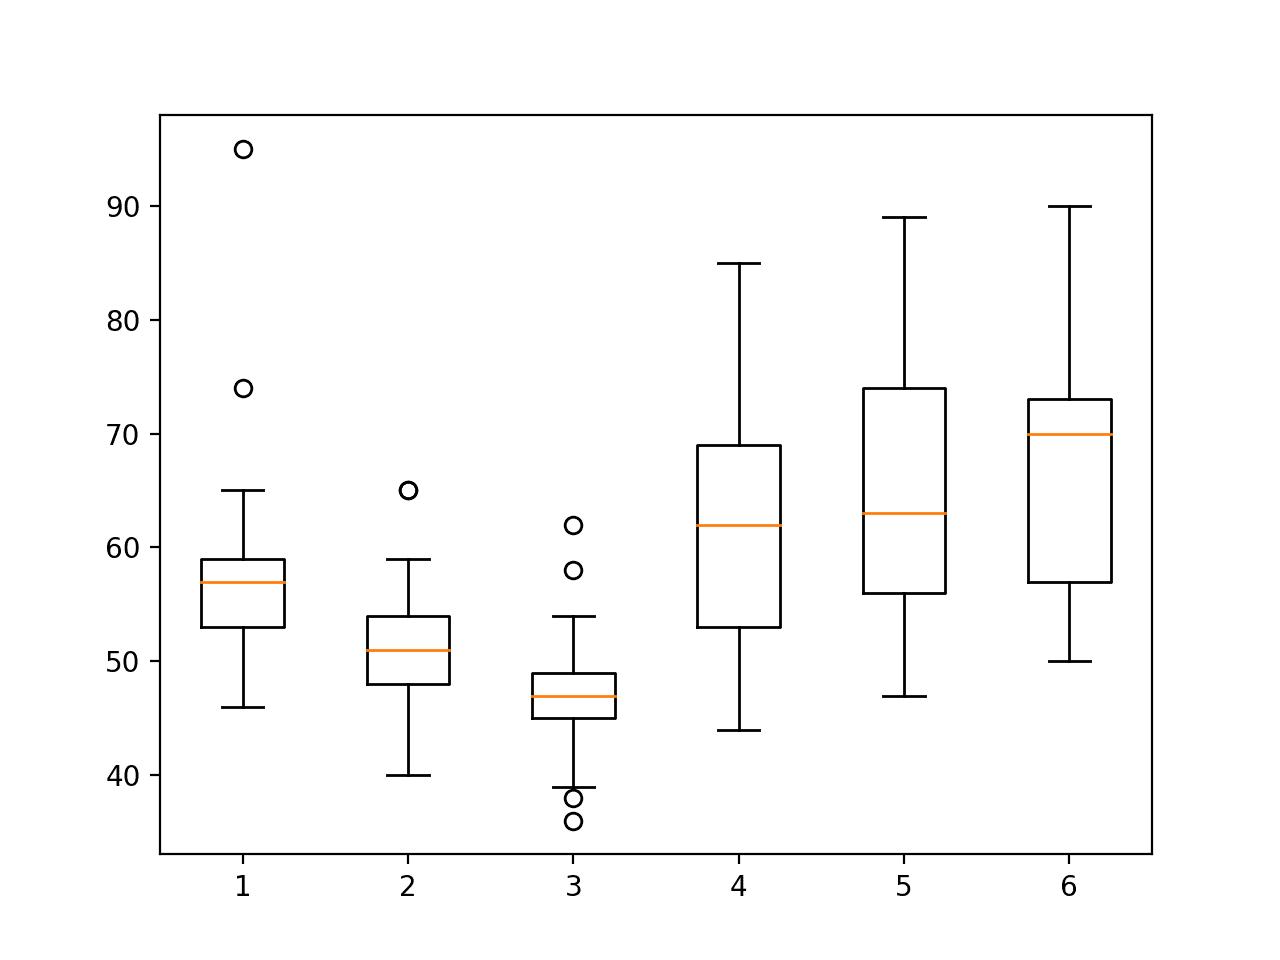 Boxplot of activity durations per subject on train set